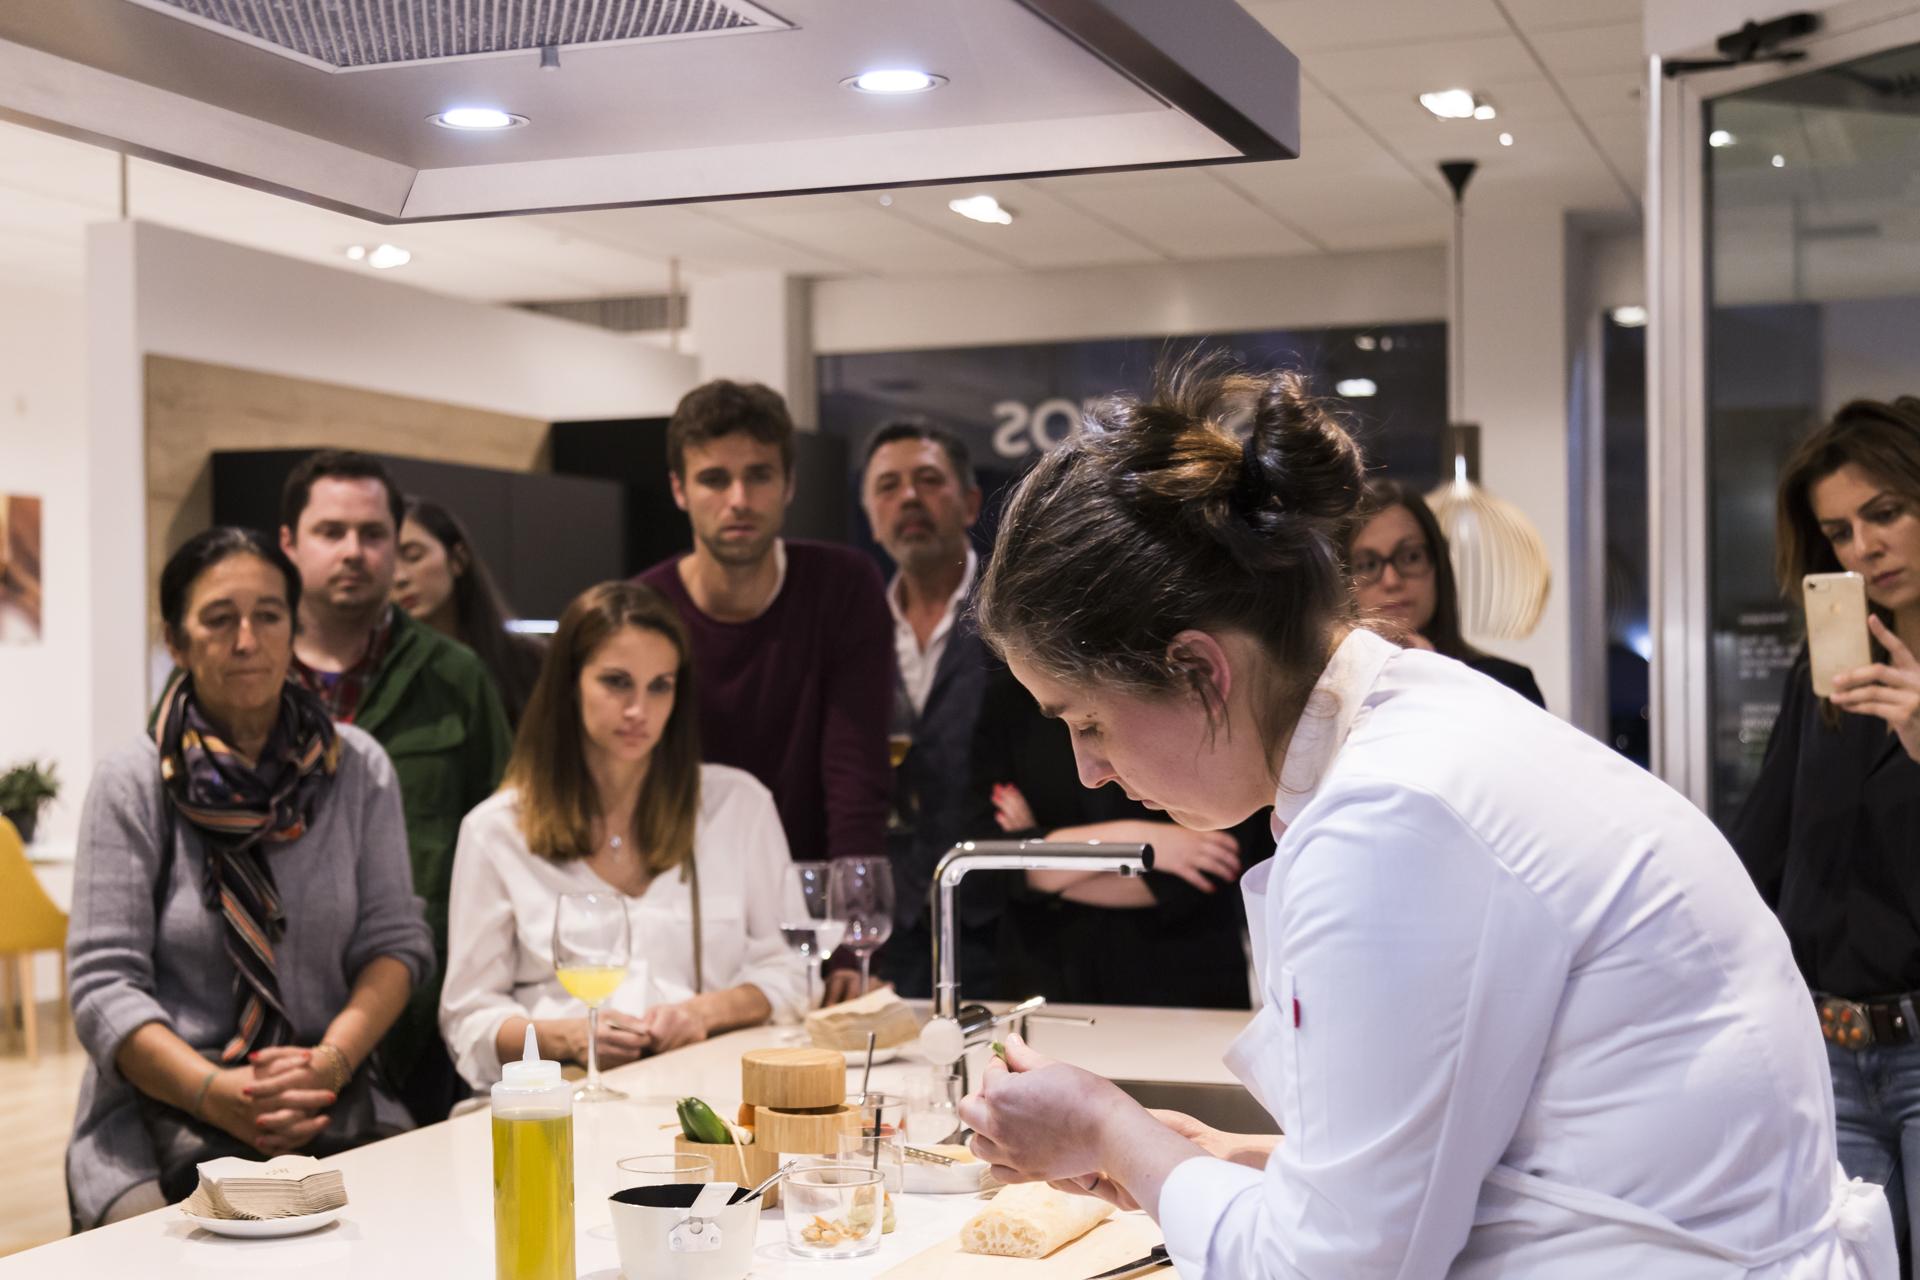 cocinas-santos-santiago-interiores-evento-showcooking-clientes-5